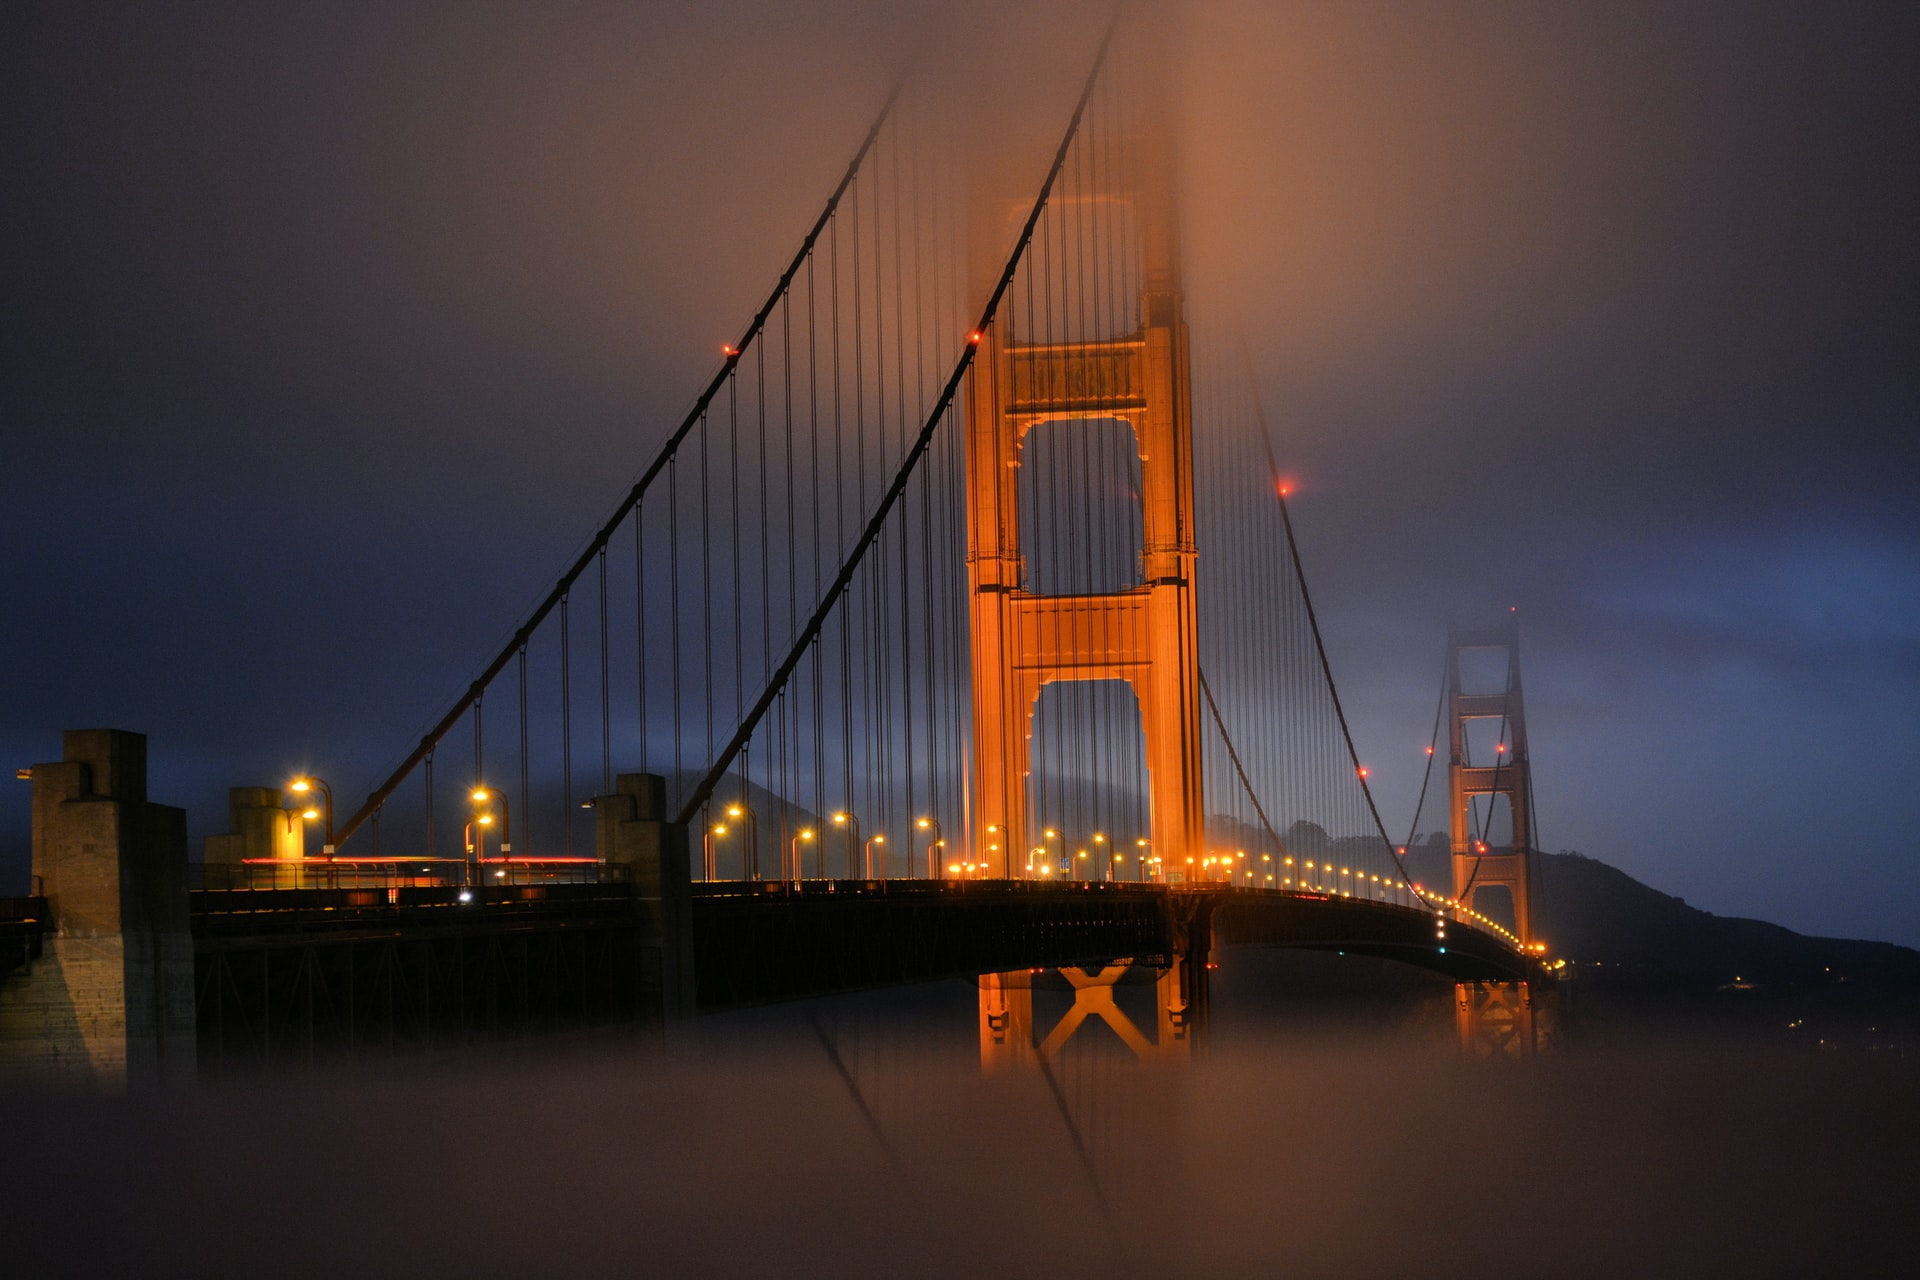 Golden Gate Bridge in the fog lit up at night